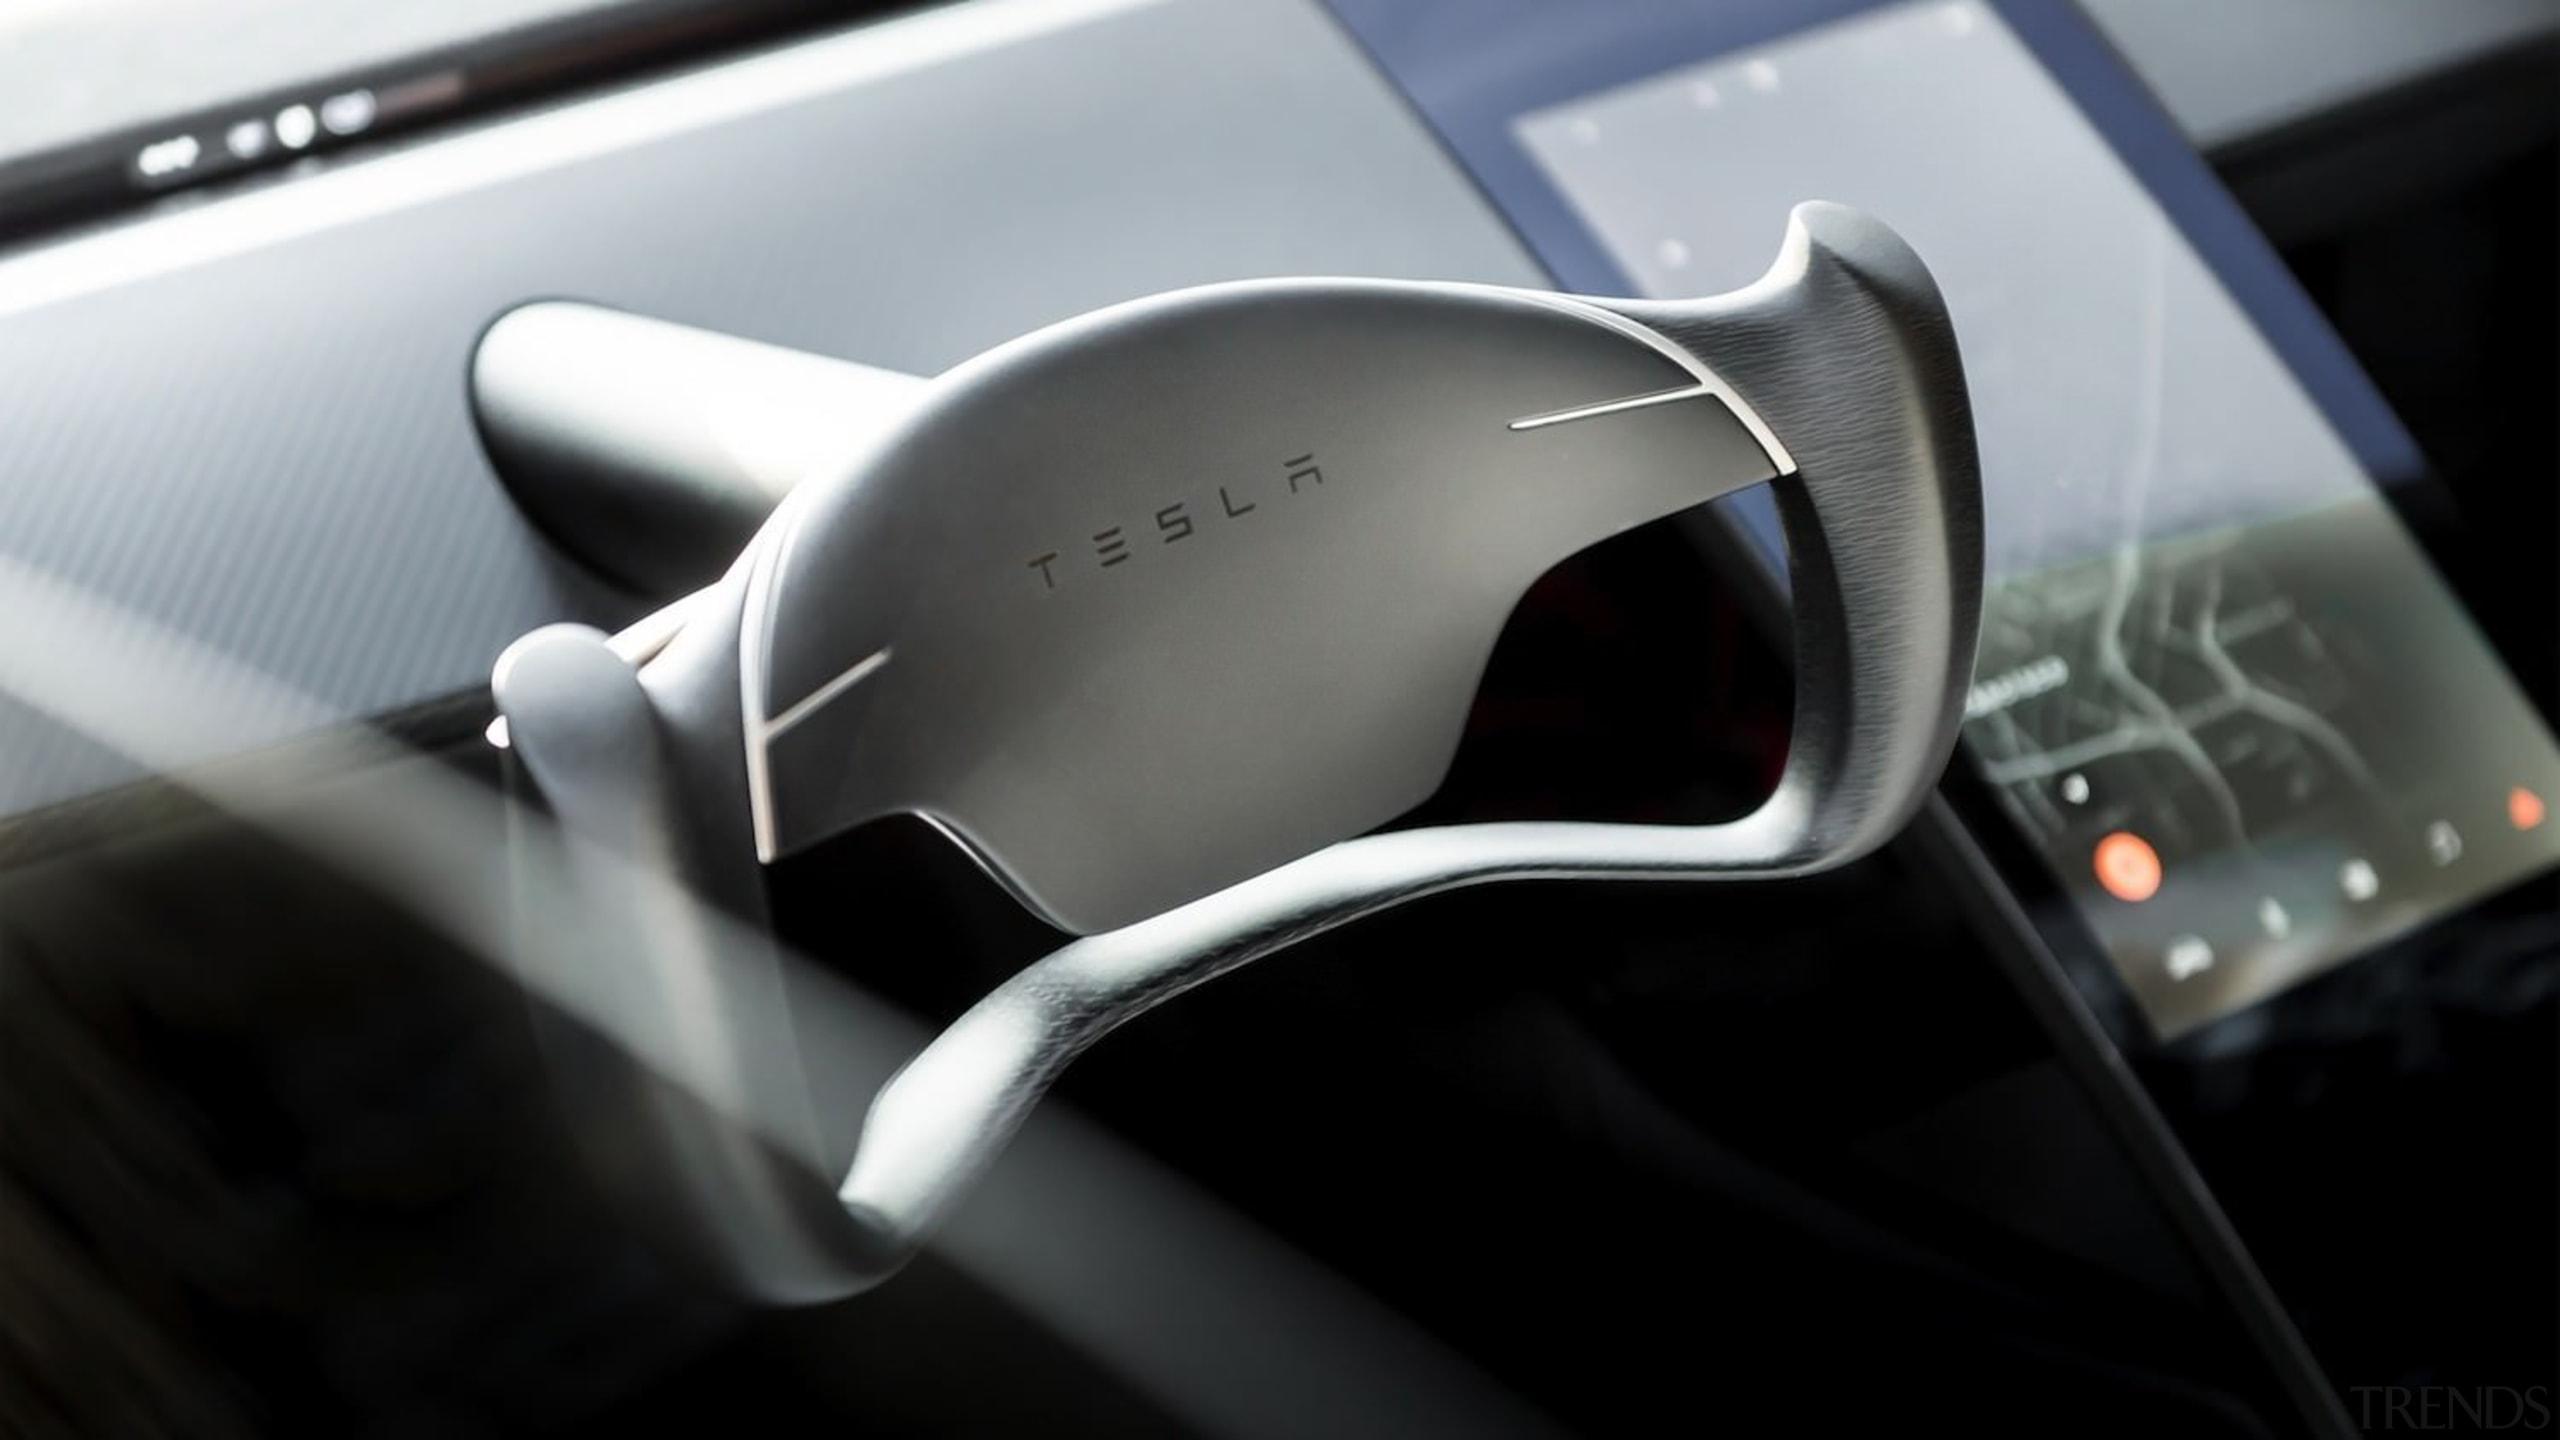 Tesla's new Roadster - Tesla's new Roadster - automotive design, car, land vehicle, motor vehicle, personal luxury car, product design, steering part, steering wheel, vehicle, black, gray